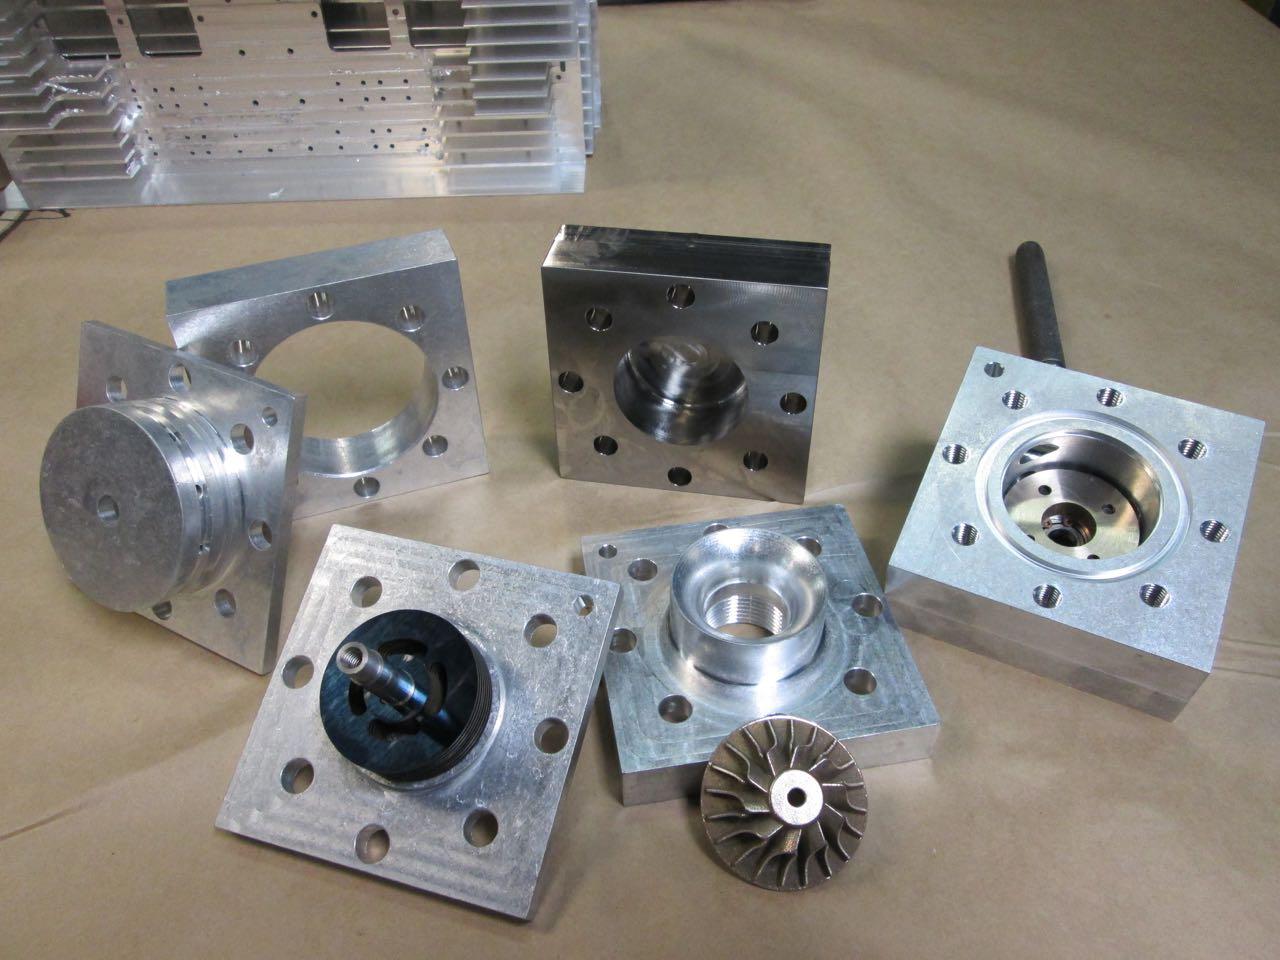 Modular Block Turbine Kit